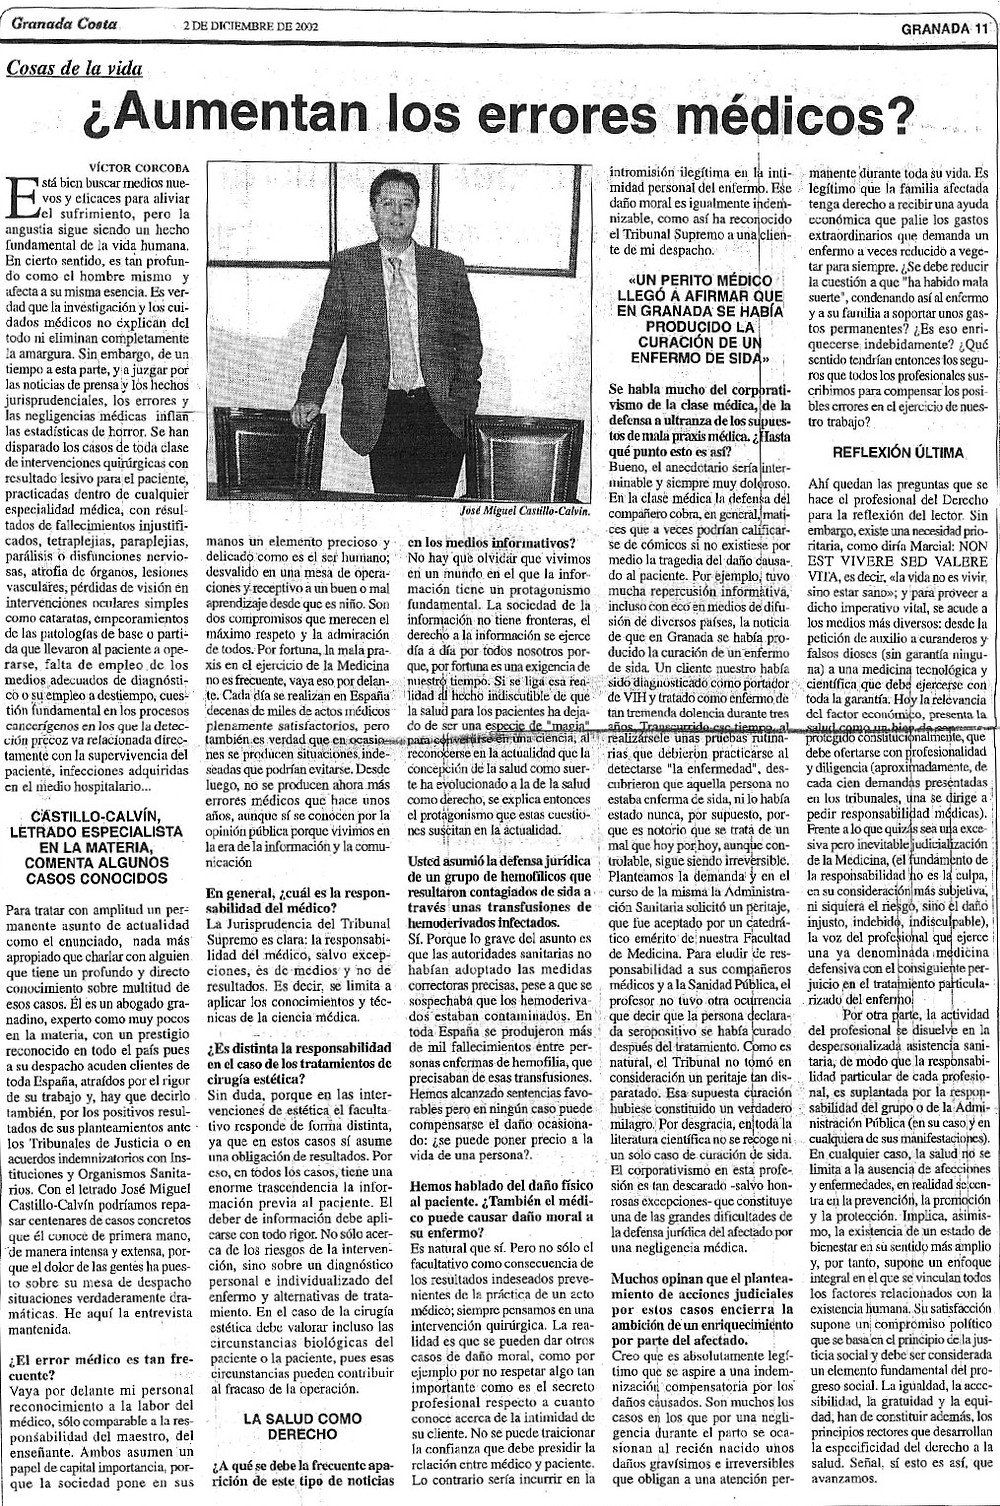 abogados casos de negligencias médicas. Castillo Calvin Abogados Madrid Granada